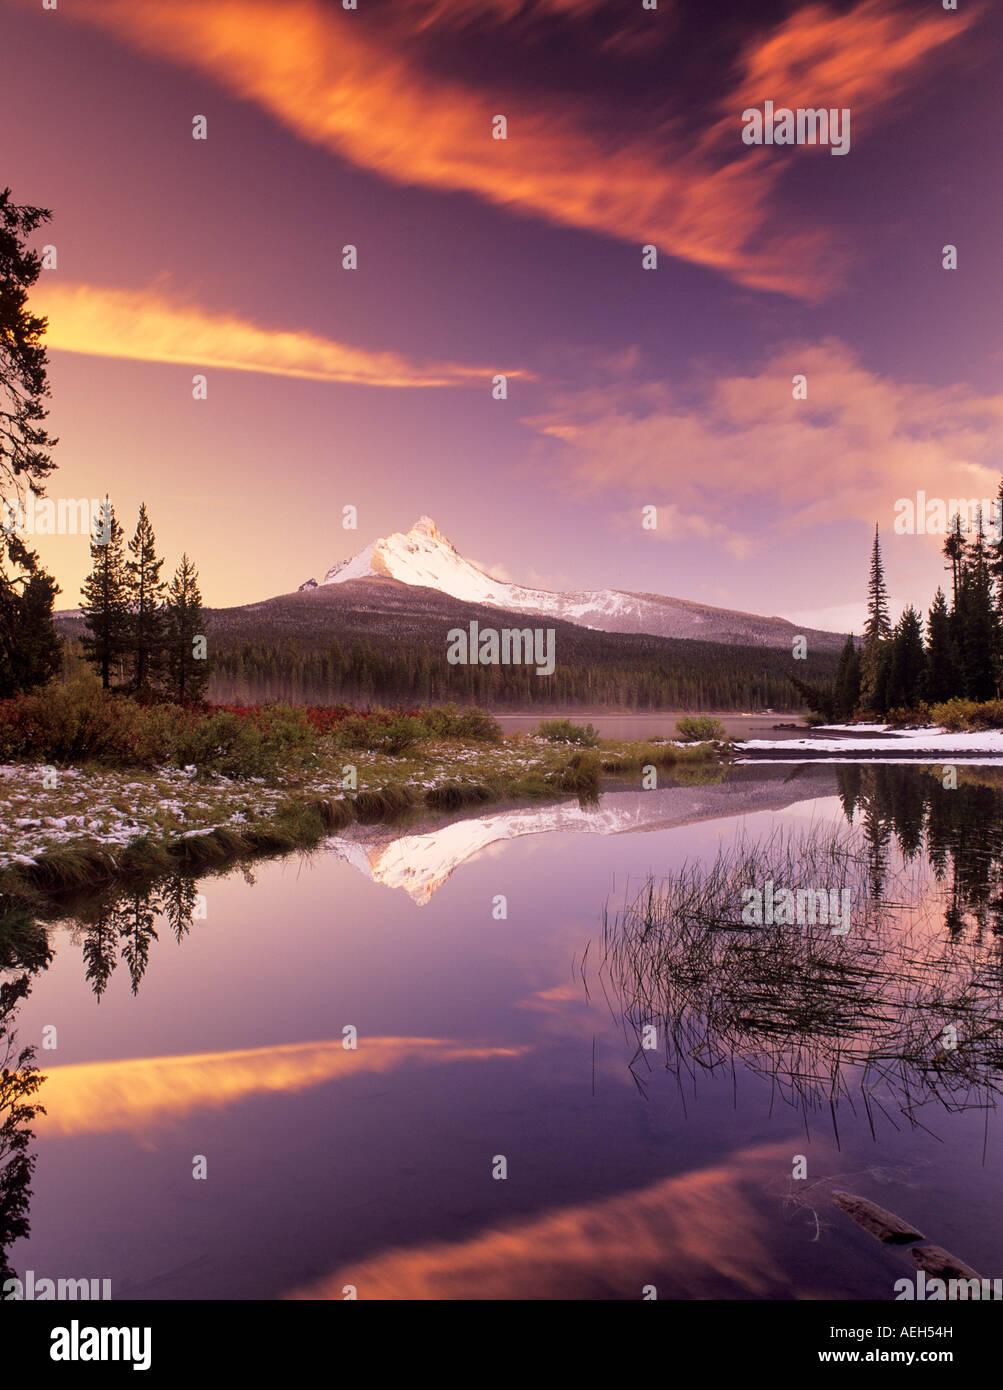 Mount Washington and Big Lake with snow and sunset Oregon - Stock Image